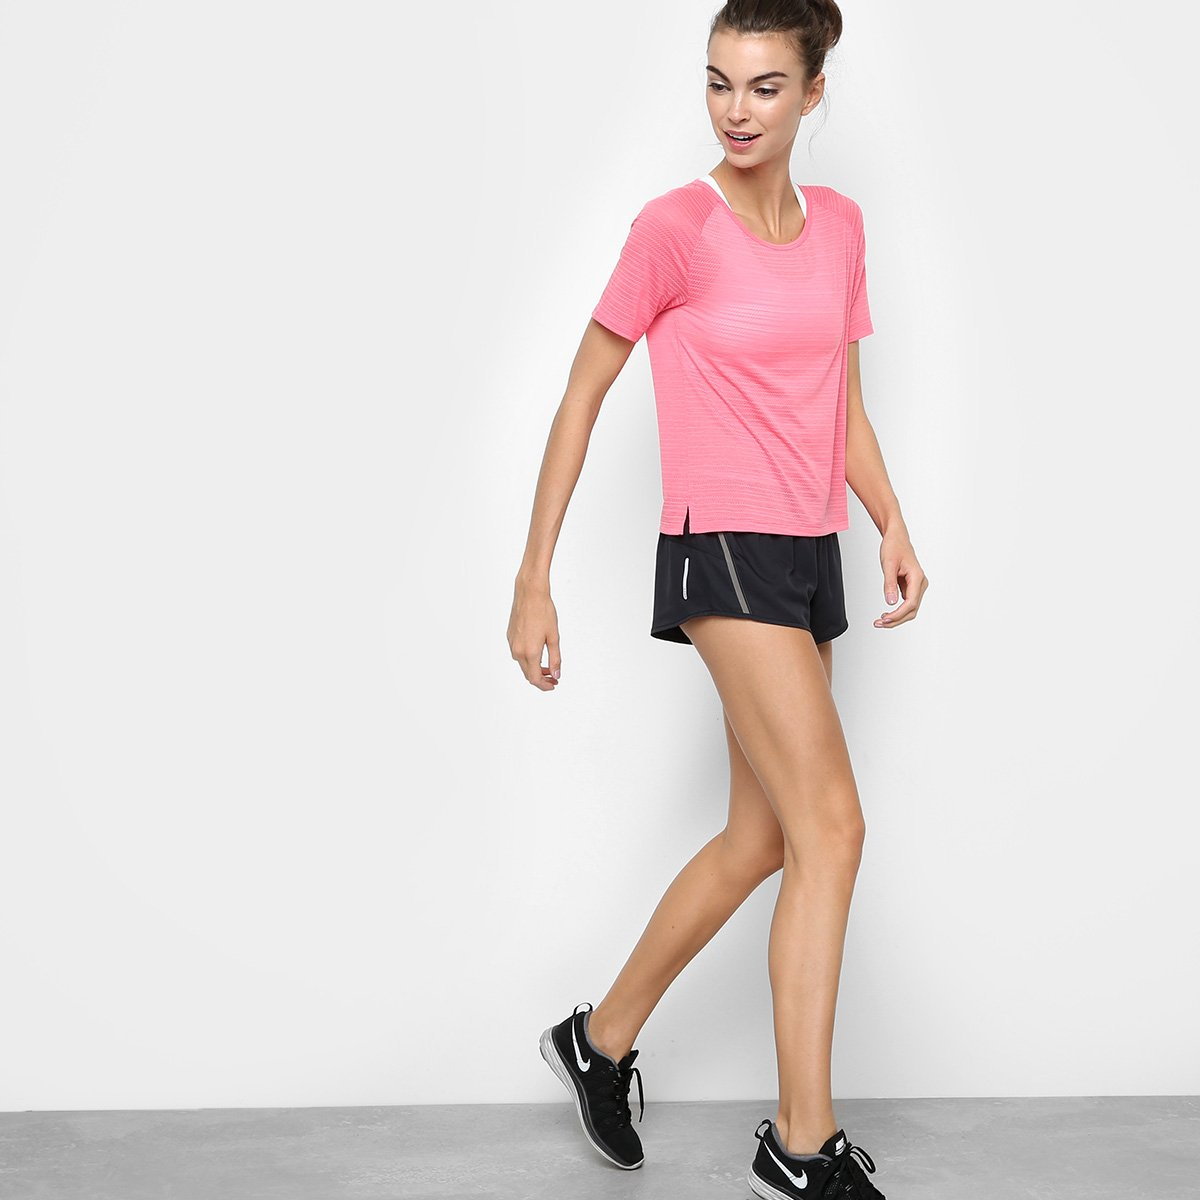 Miler Camiseta Rosa Nike Camiseta Miler Rosa Breathe Nike SS Feminina Feminina Breathe Miler SS Camiseta Nike RqRrP